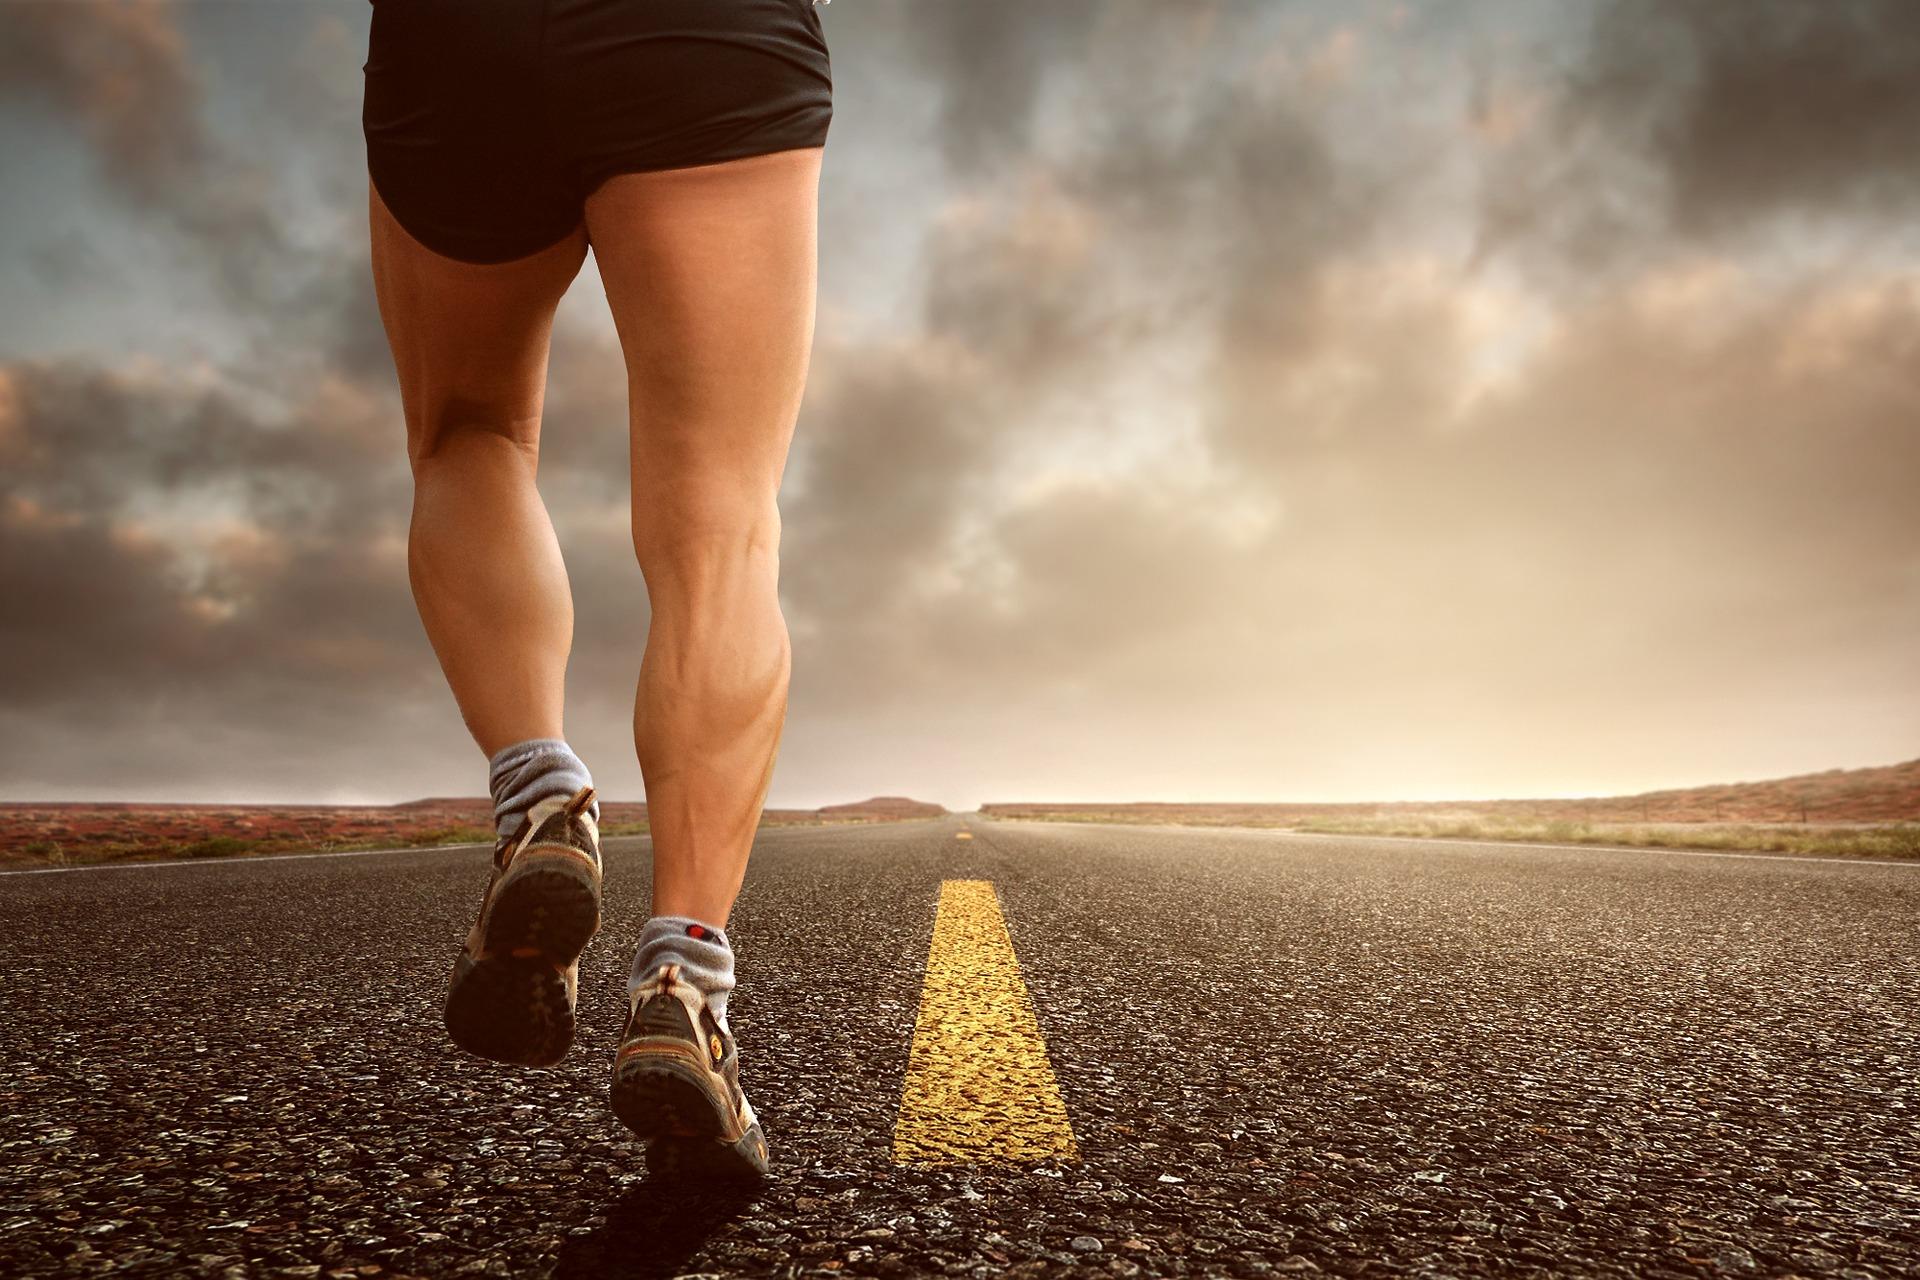 jogging-_iuvoTechnologies_cloud